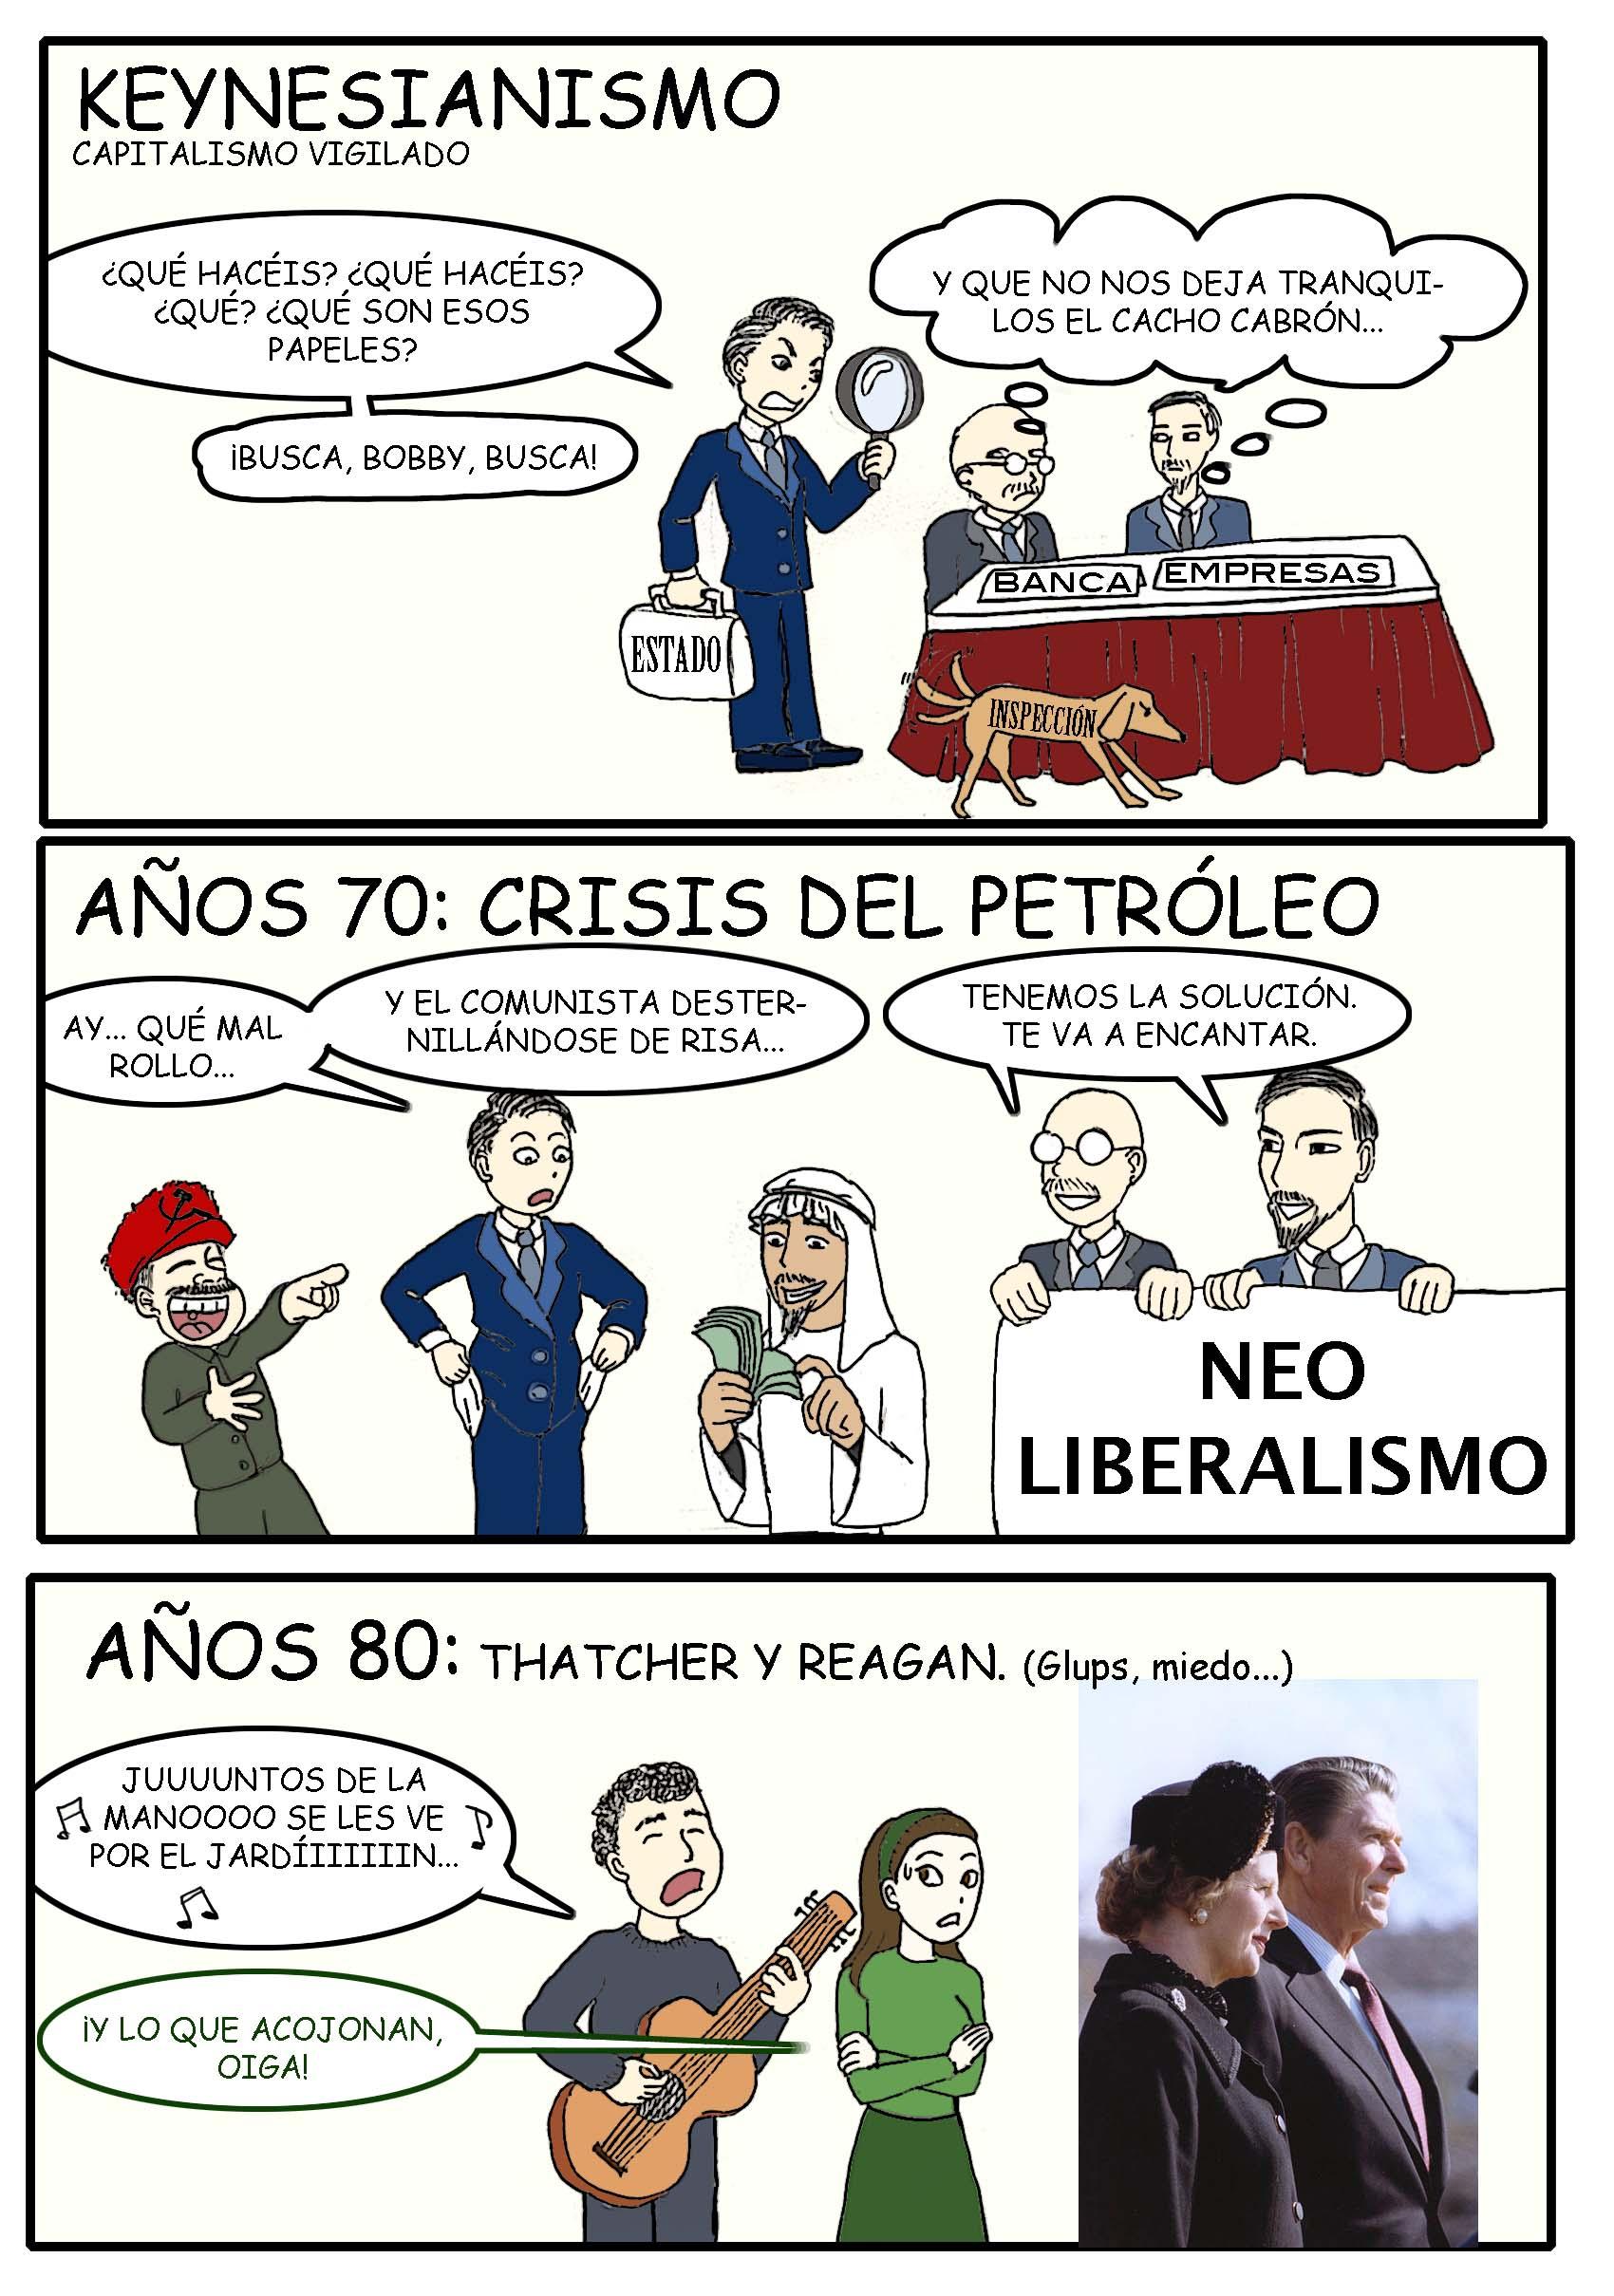 Cómic sobre el neoliberalismo